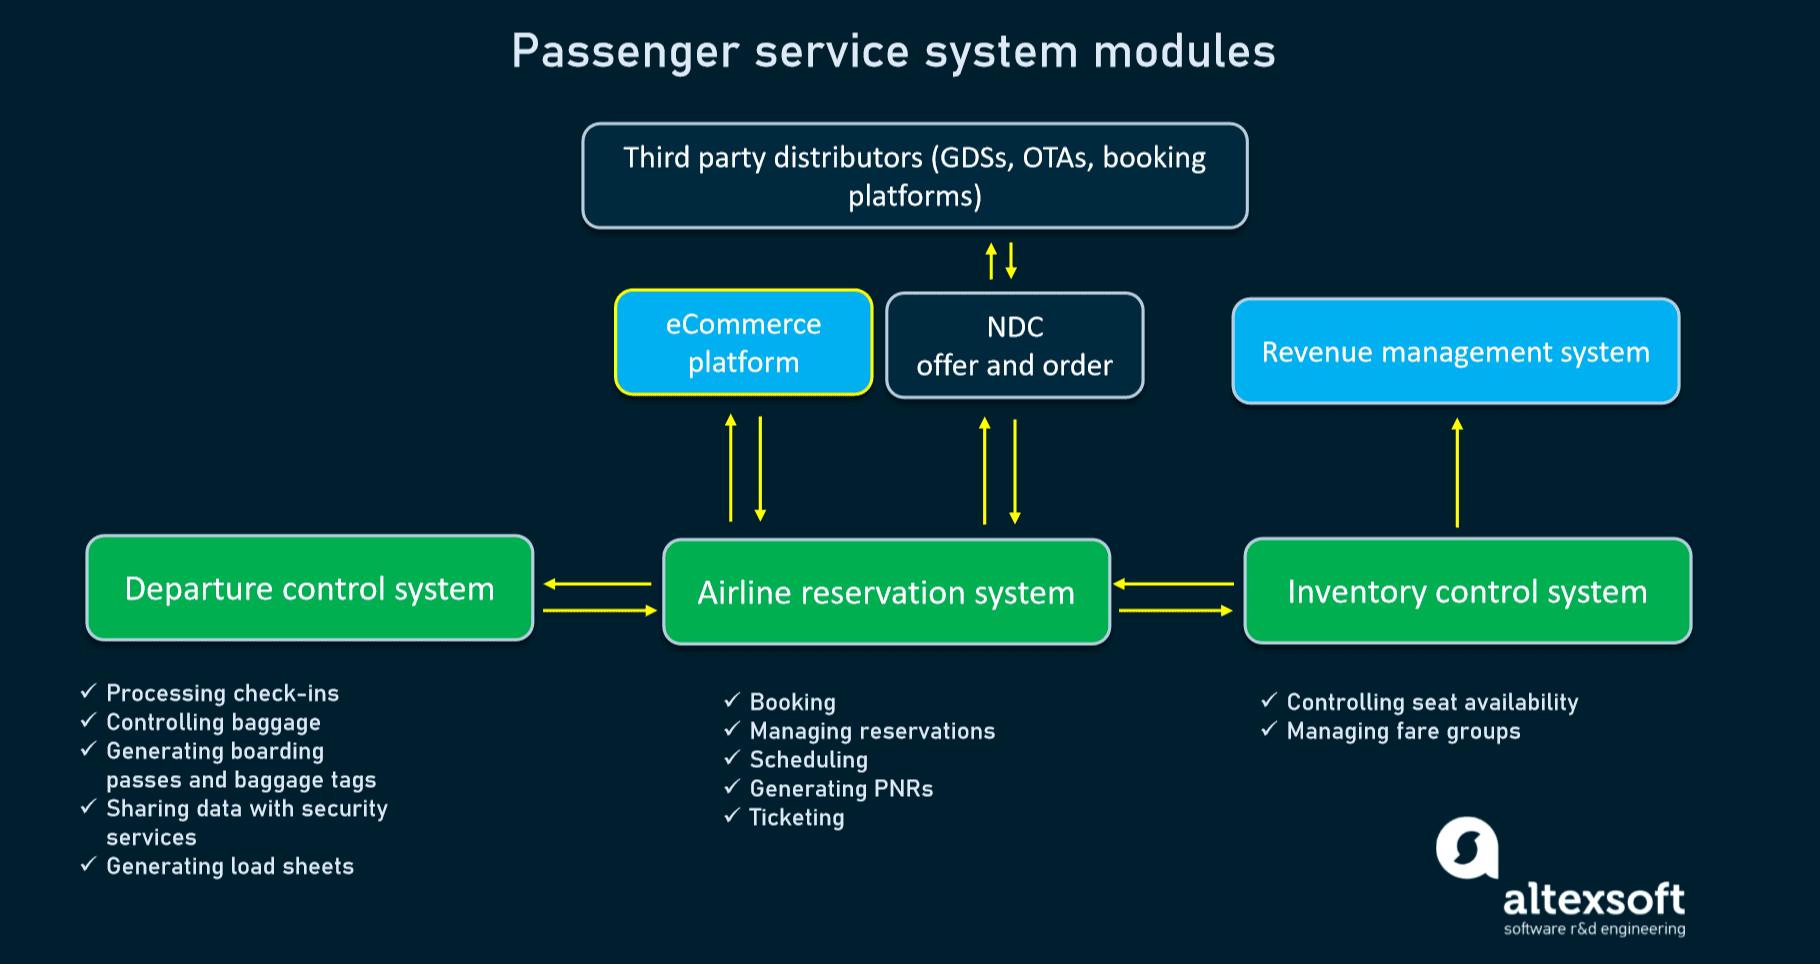 Passenger service system modules